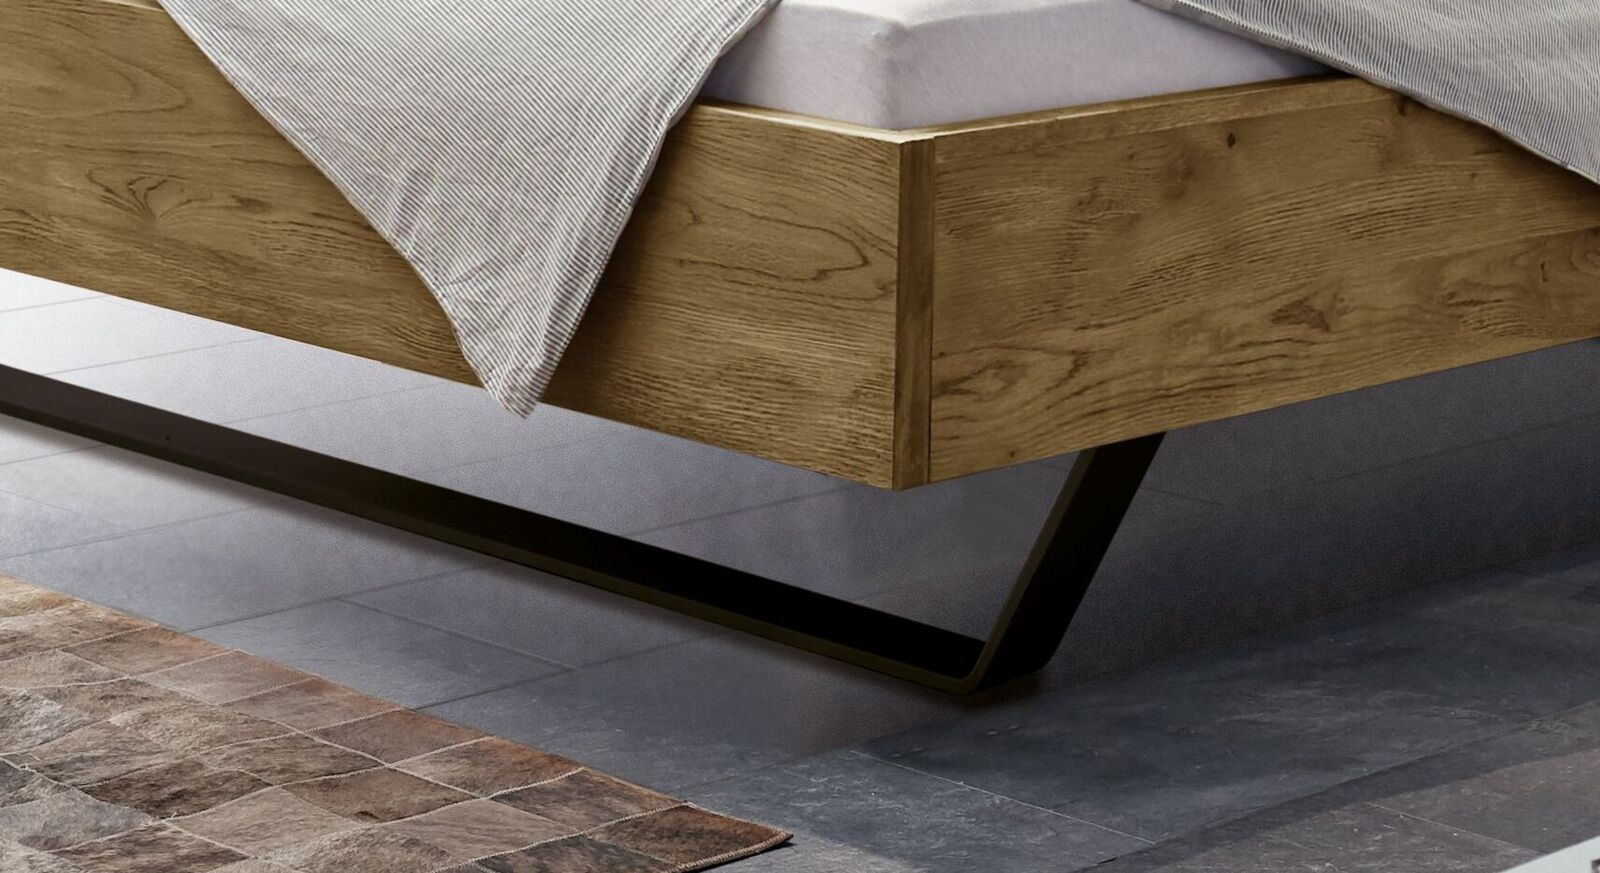 Bett Ticario mit massiven Metallkufen